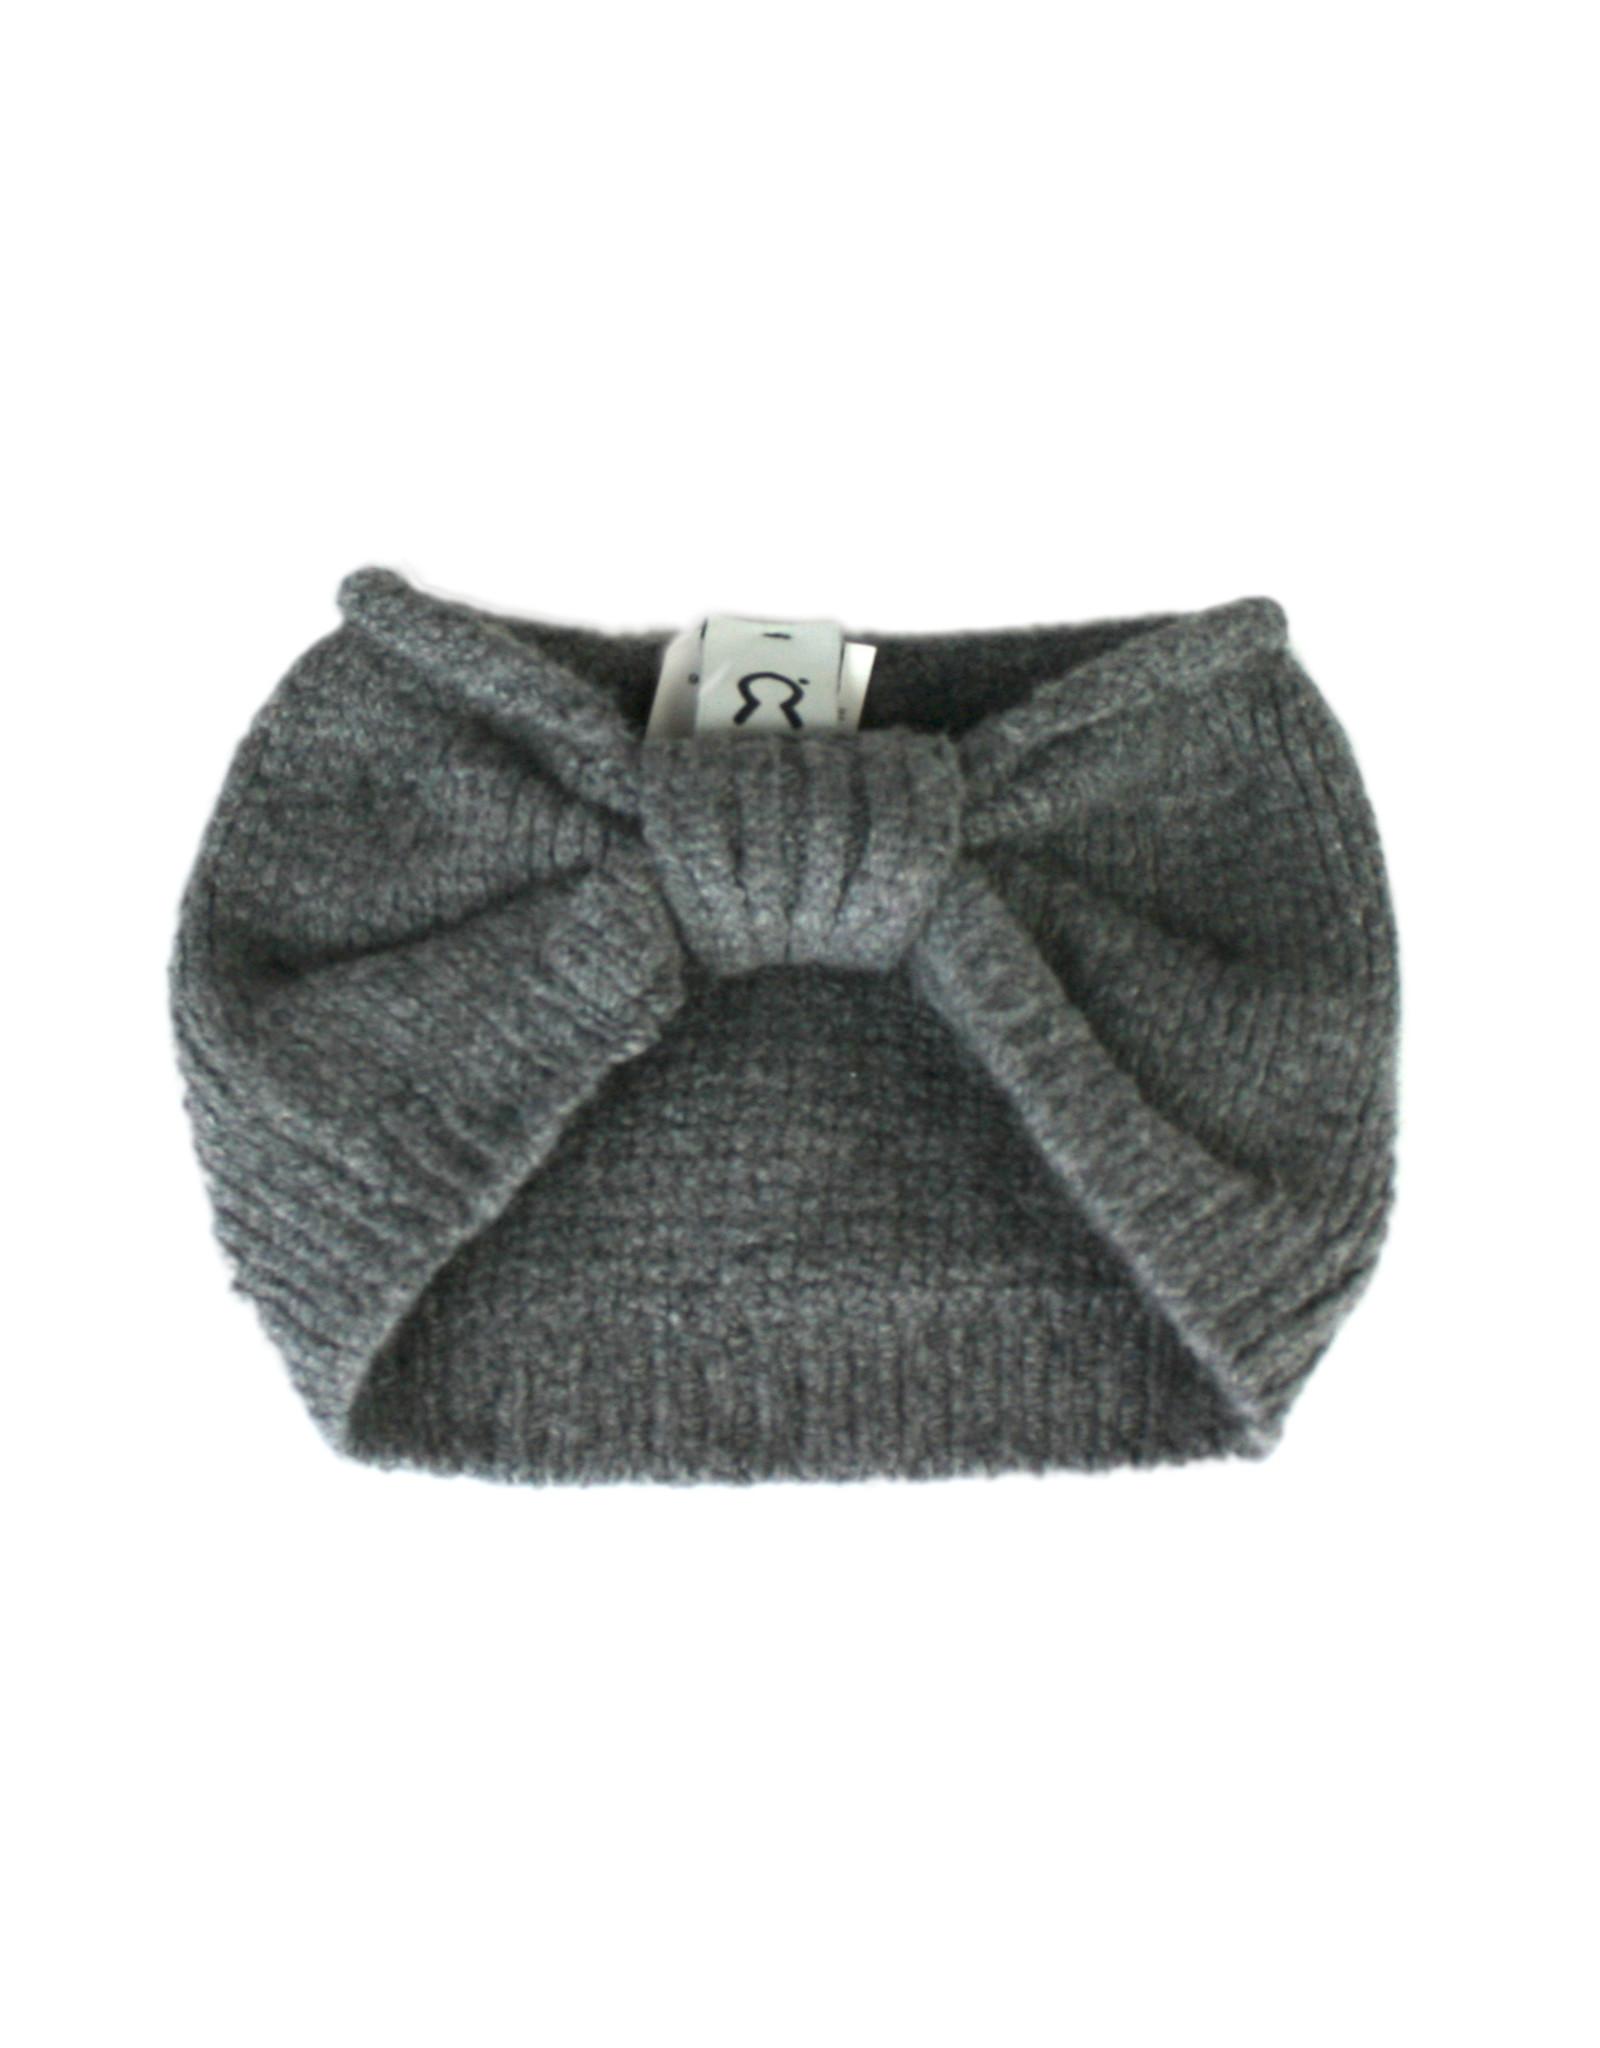 Rifò Recycled Cashmere headband - Amelia